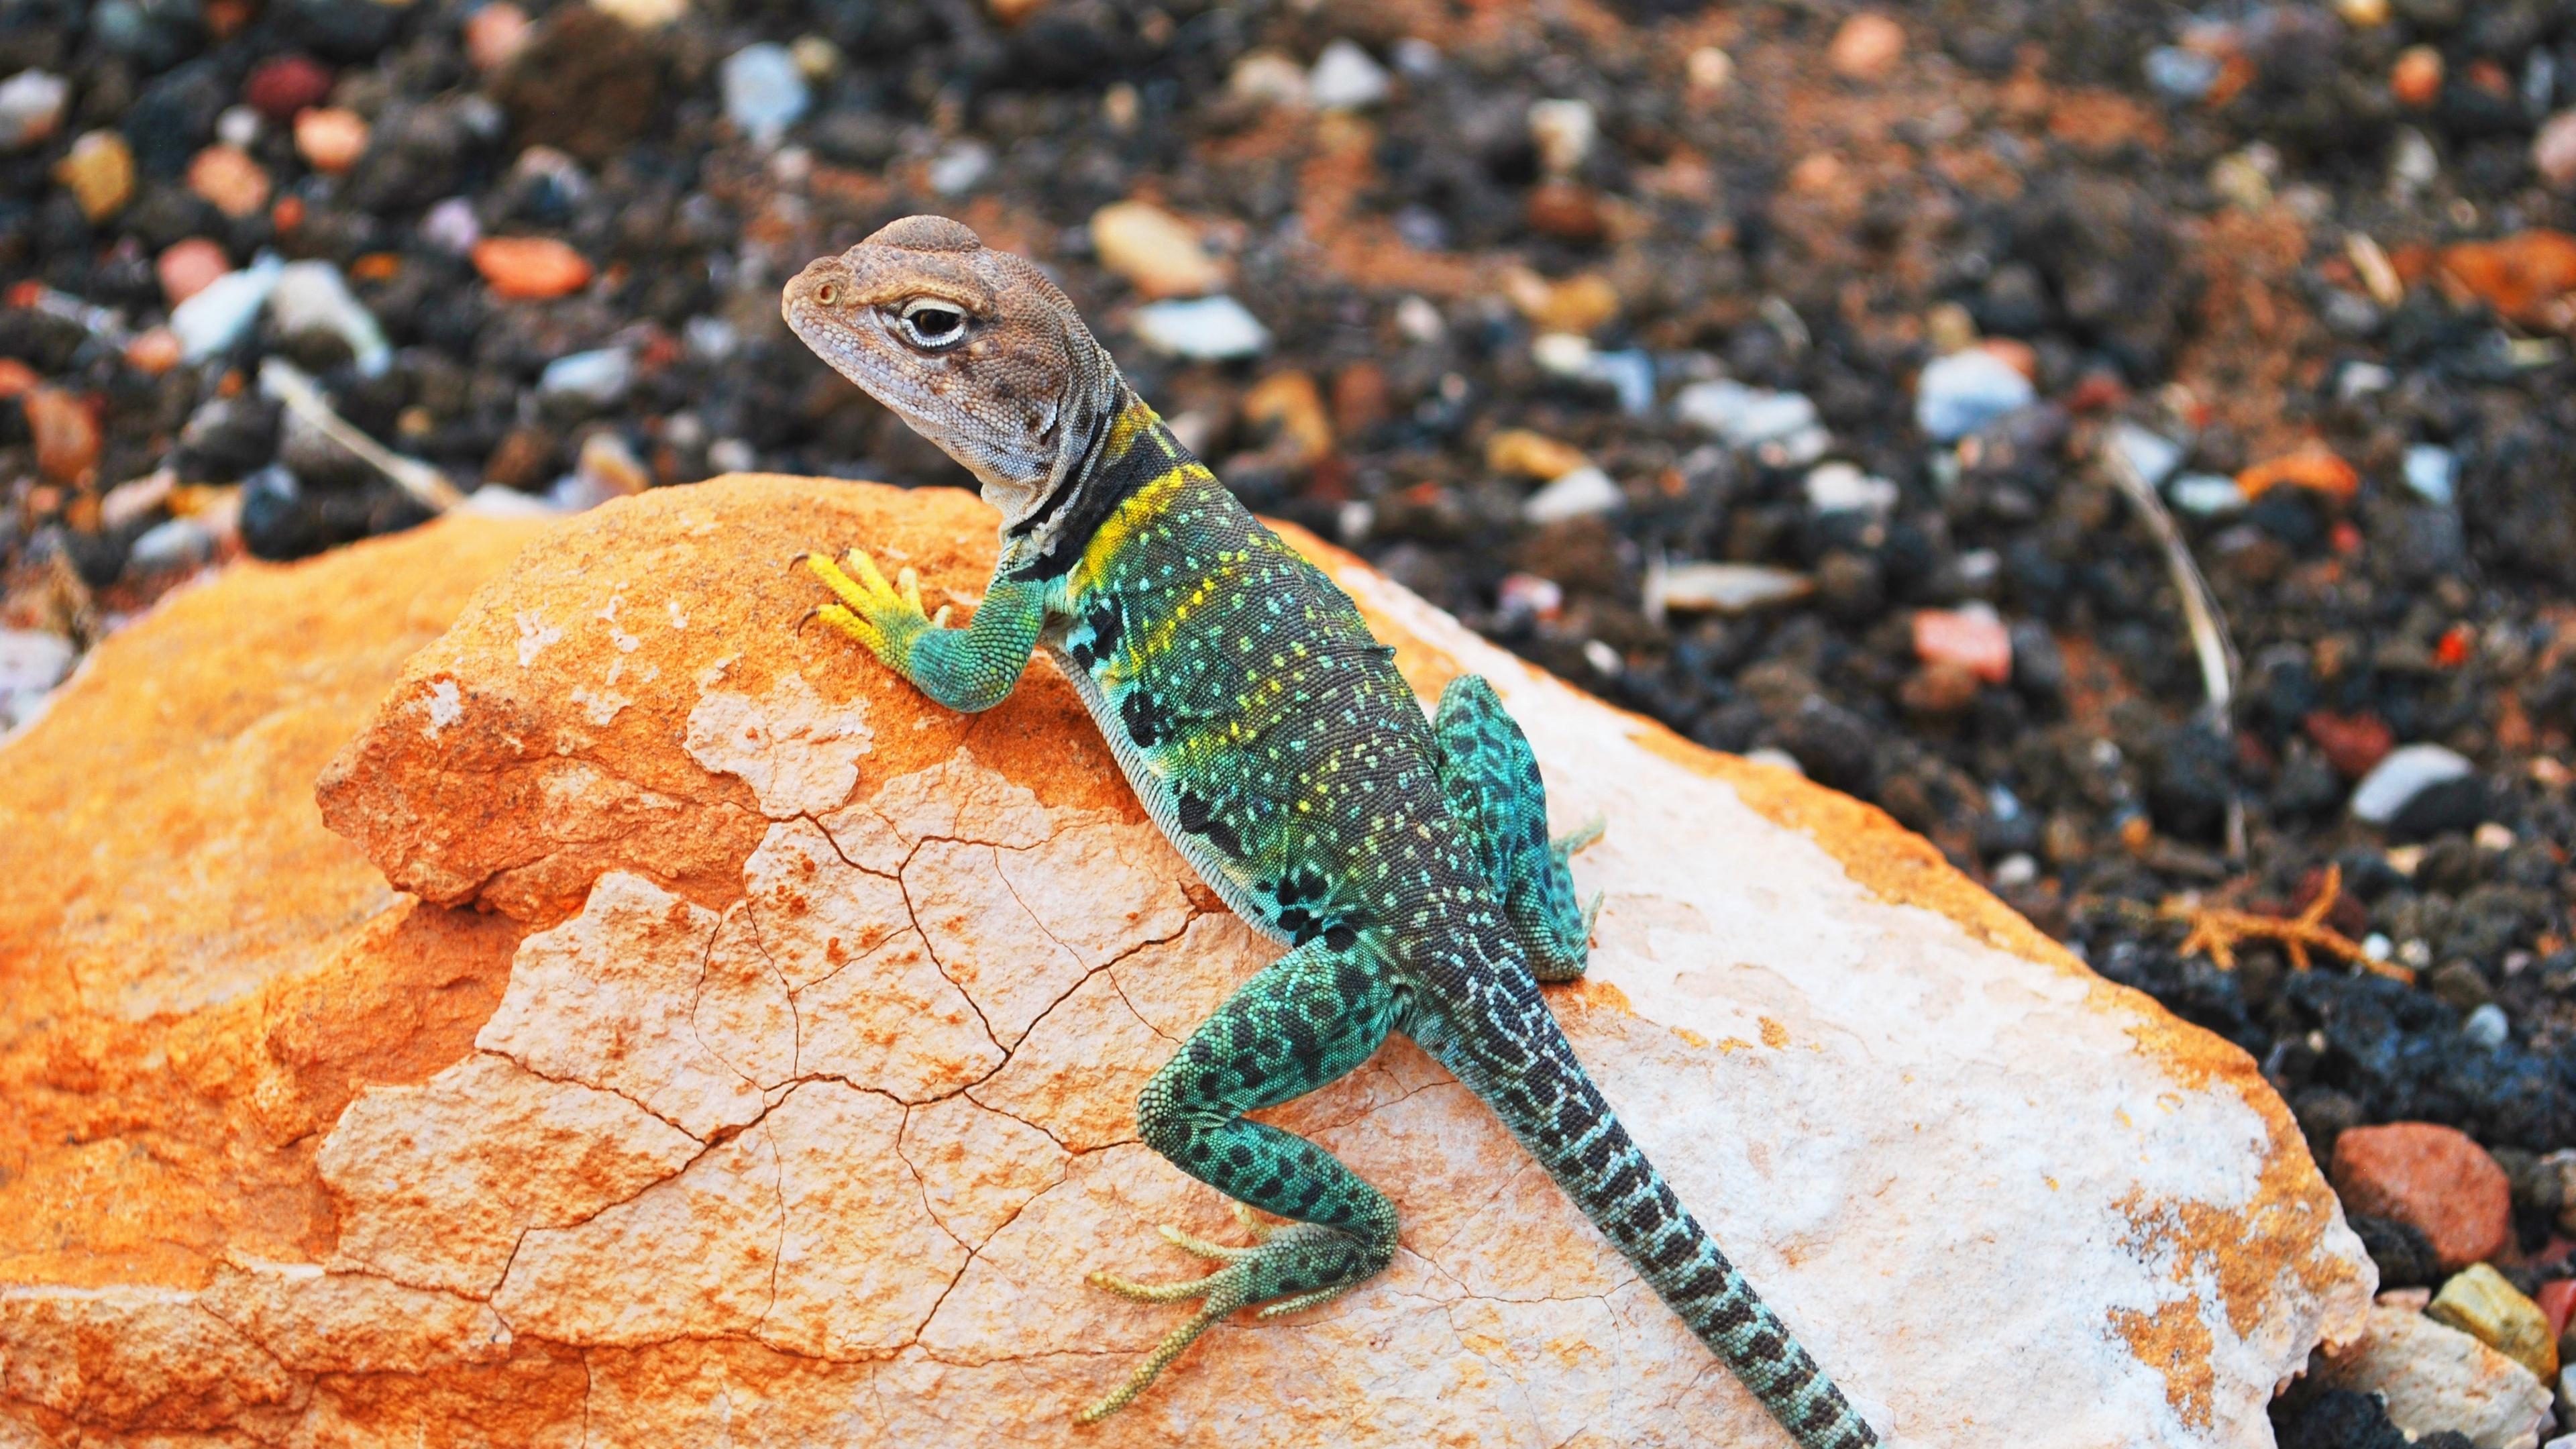 lizard gecko stones 4k 1542242742 - lizard, gecko, stones 4k - Stones, Lizard, gecko